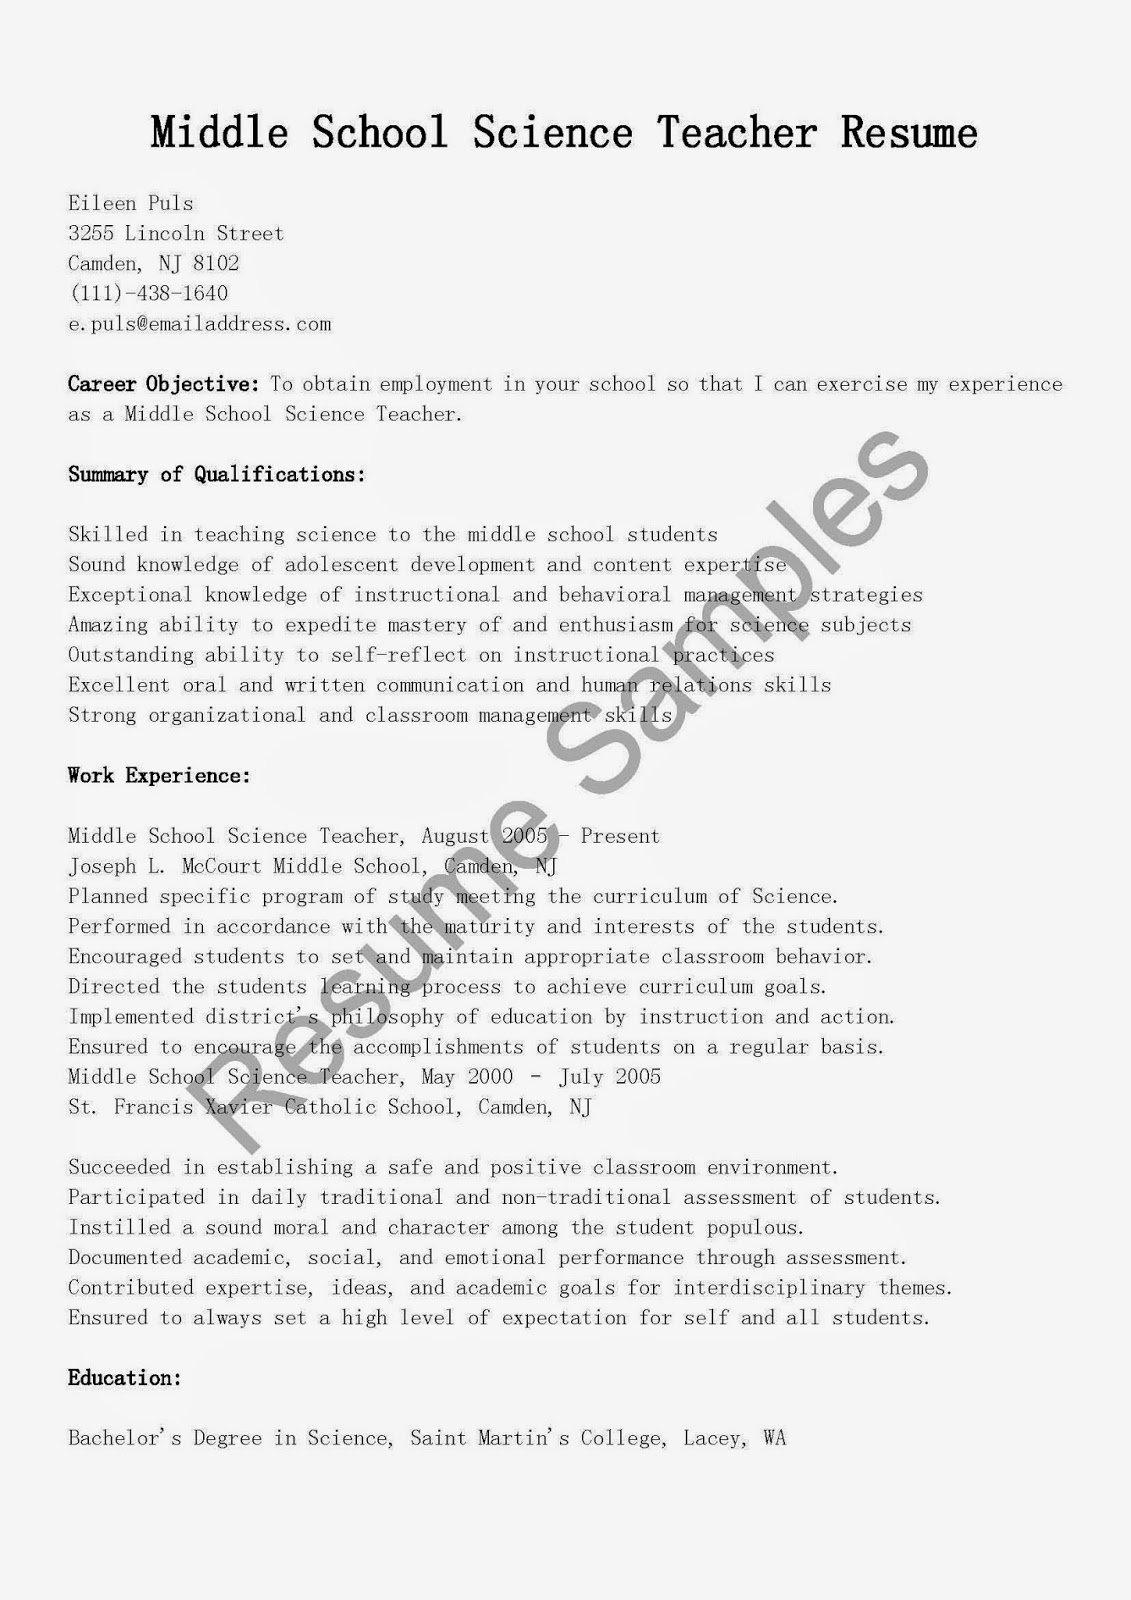 Resume Samples Middle School Science Teacher Resume Sample